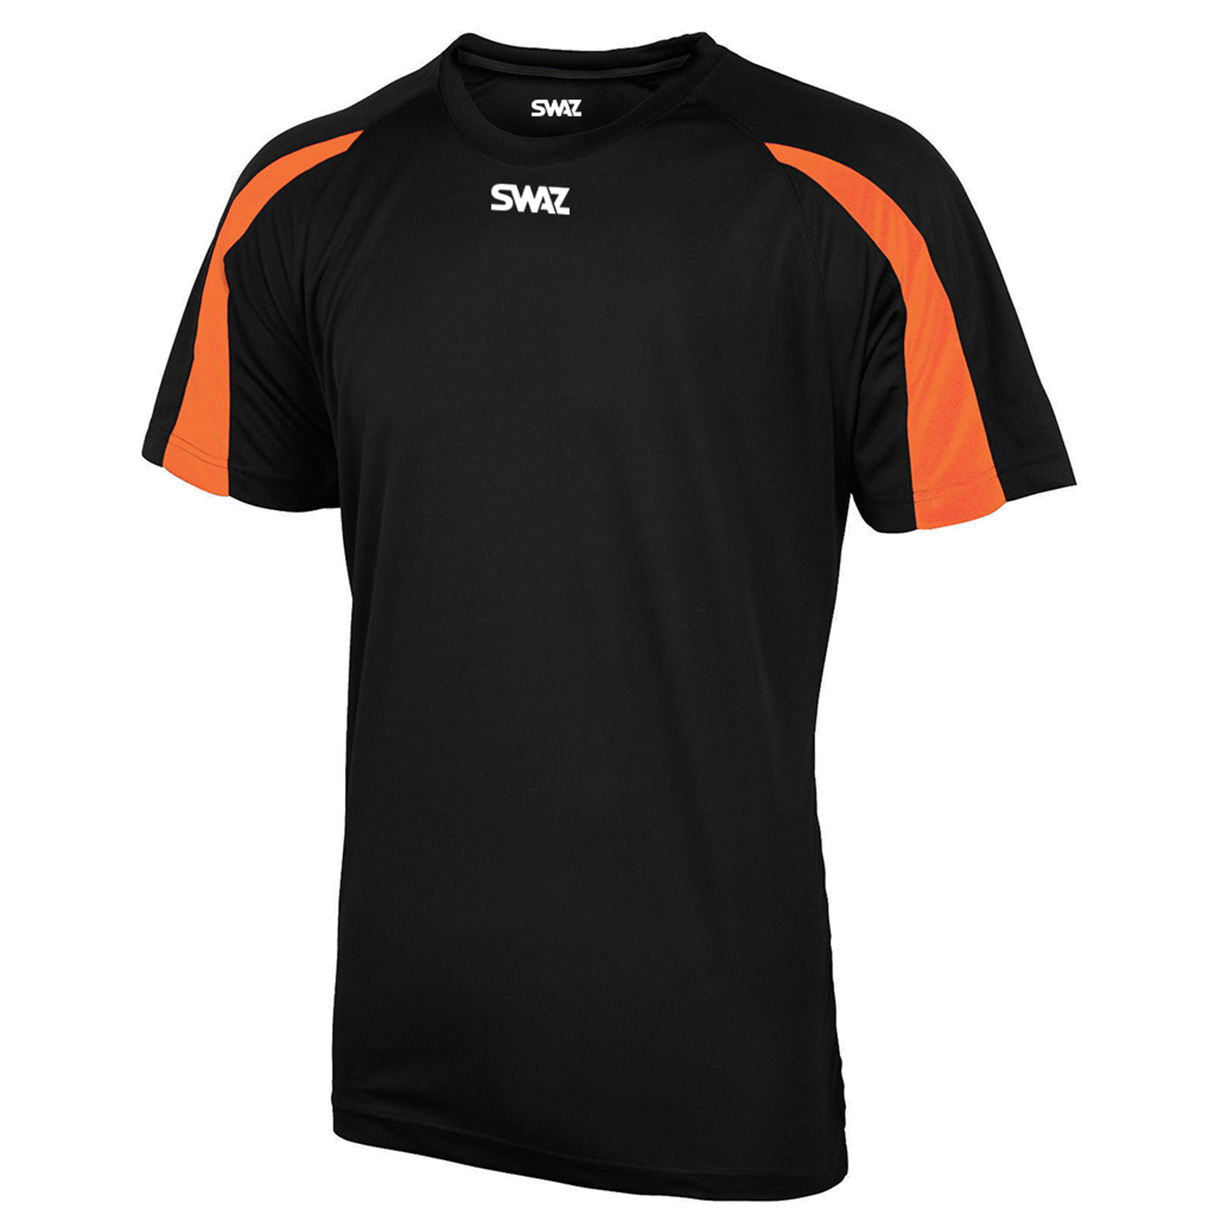 SWAZ Premier Training T-Shirt – Black/Orange